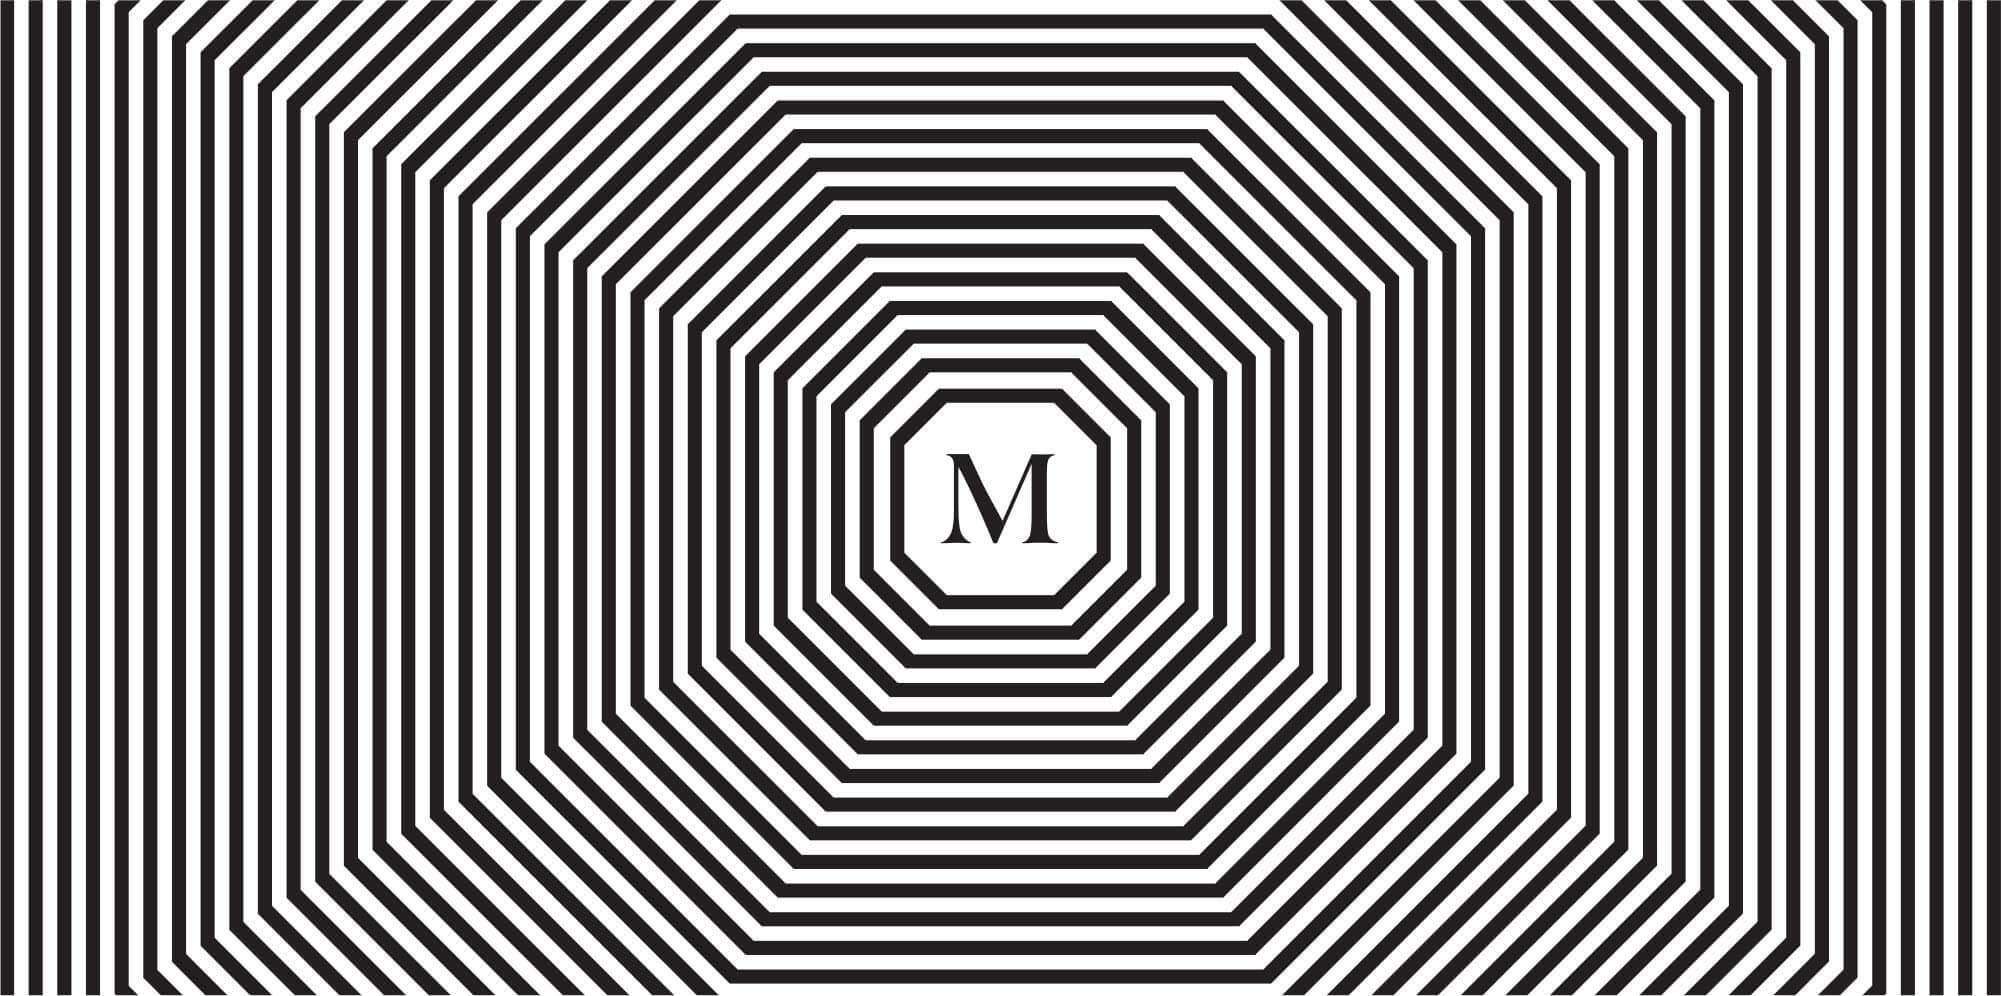 mark-hypnotic